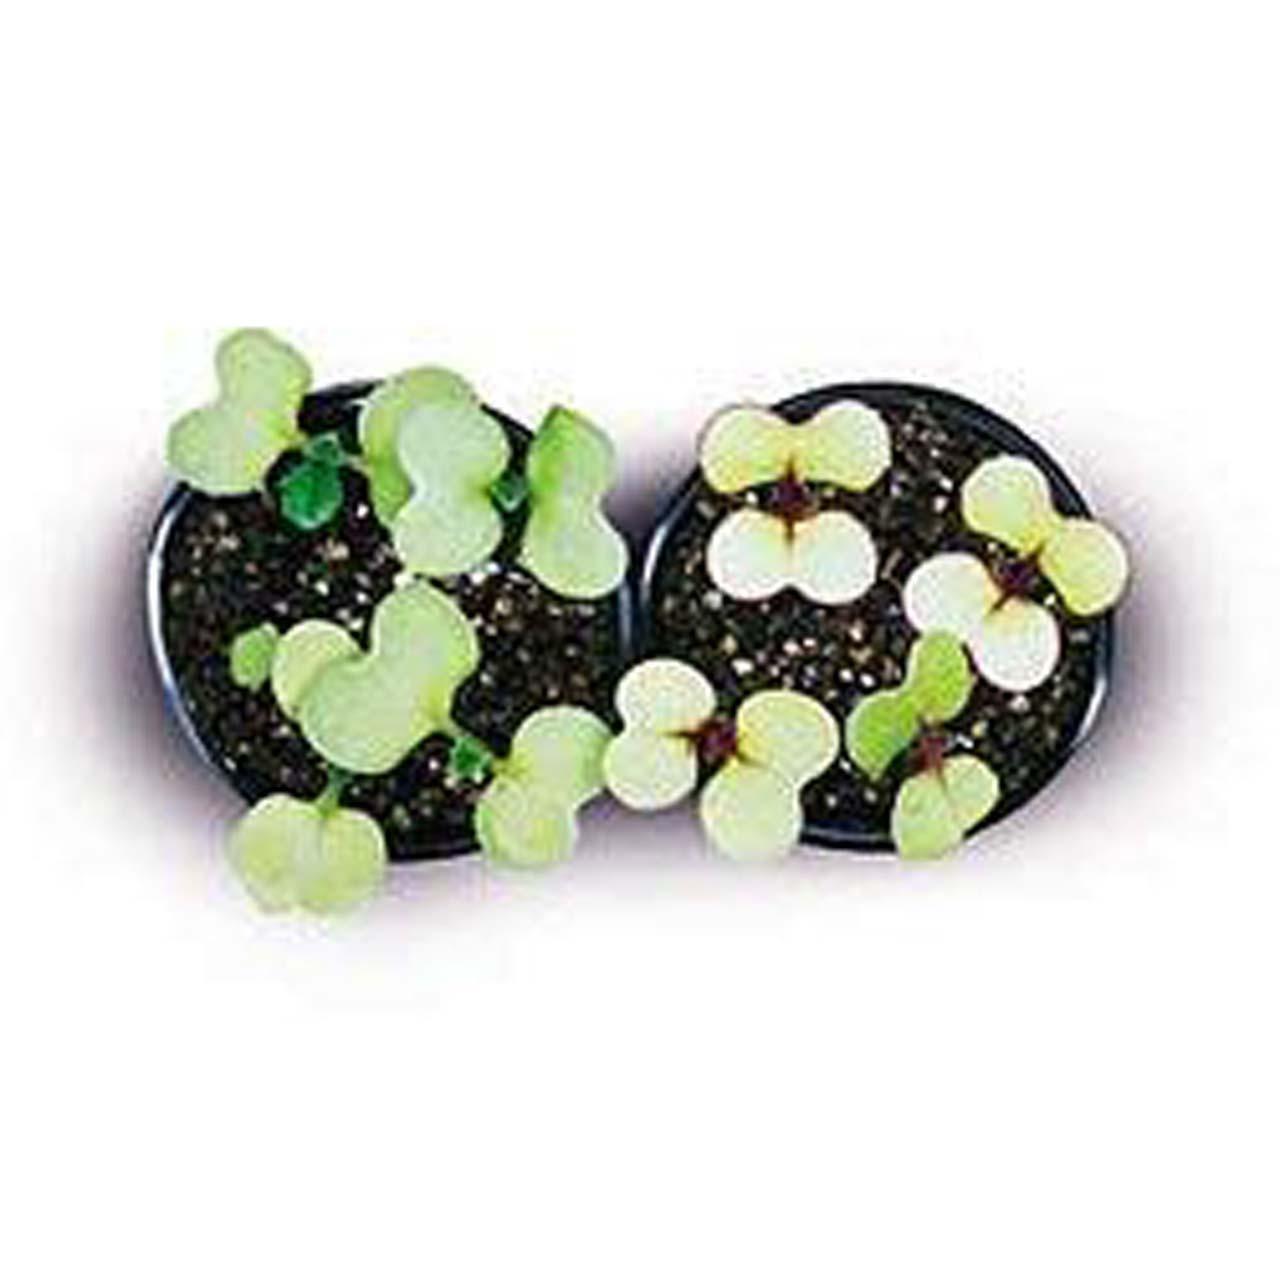 Brassica rapa seeds, F1 non-purple stem, yellow-green leaf